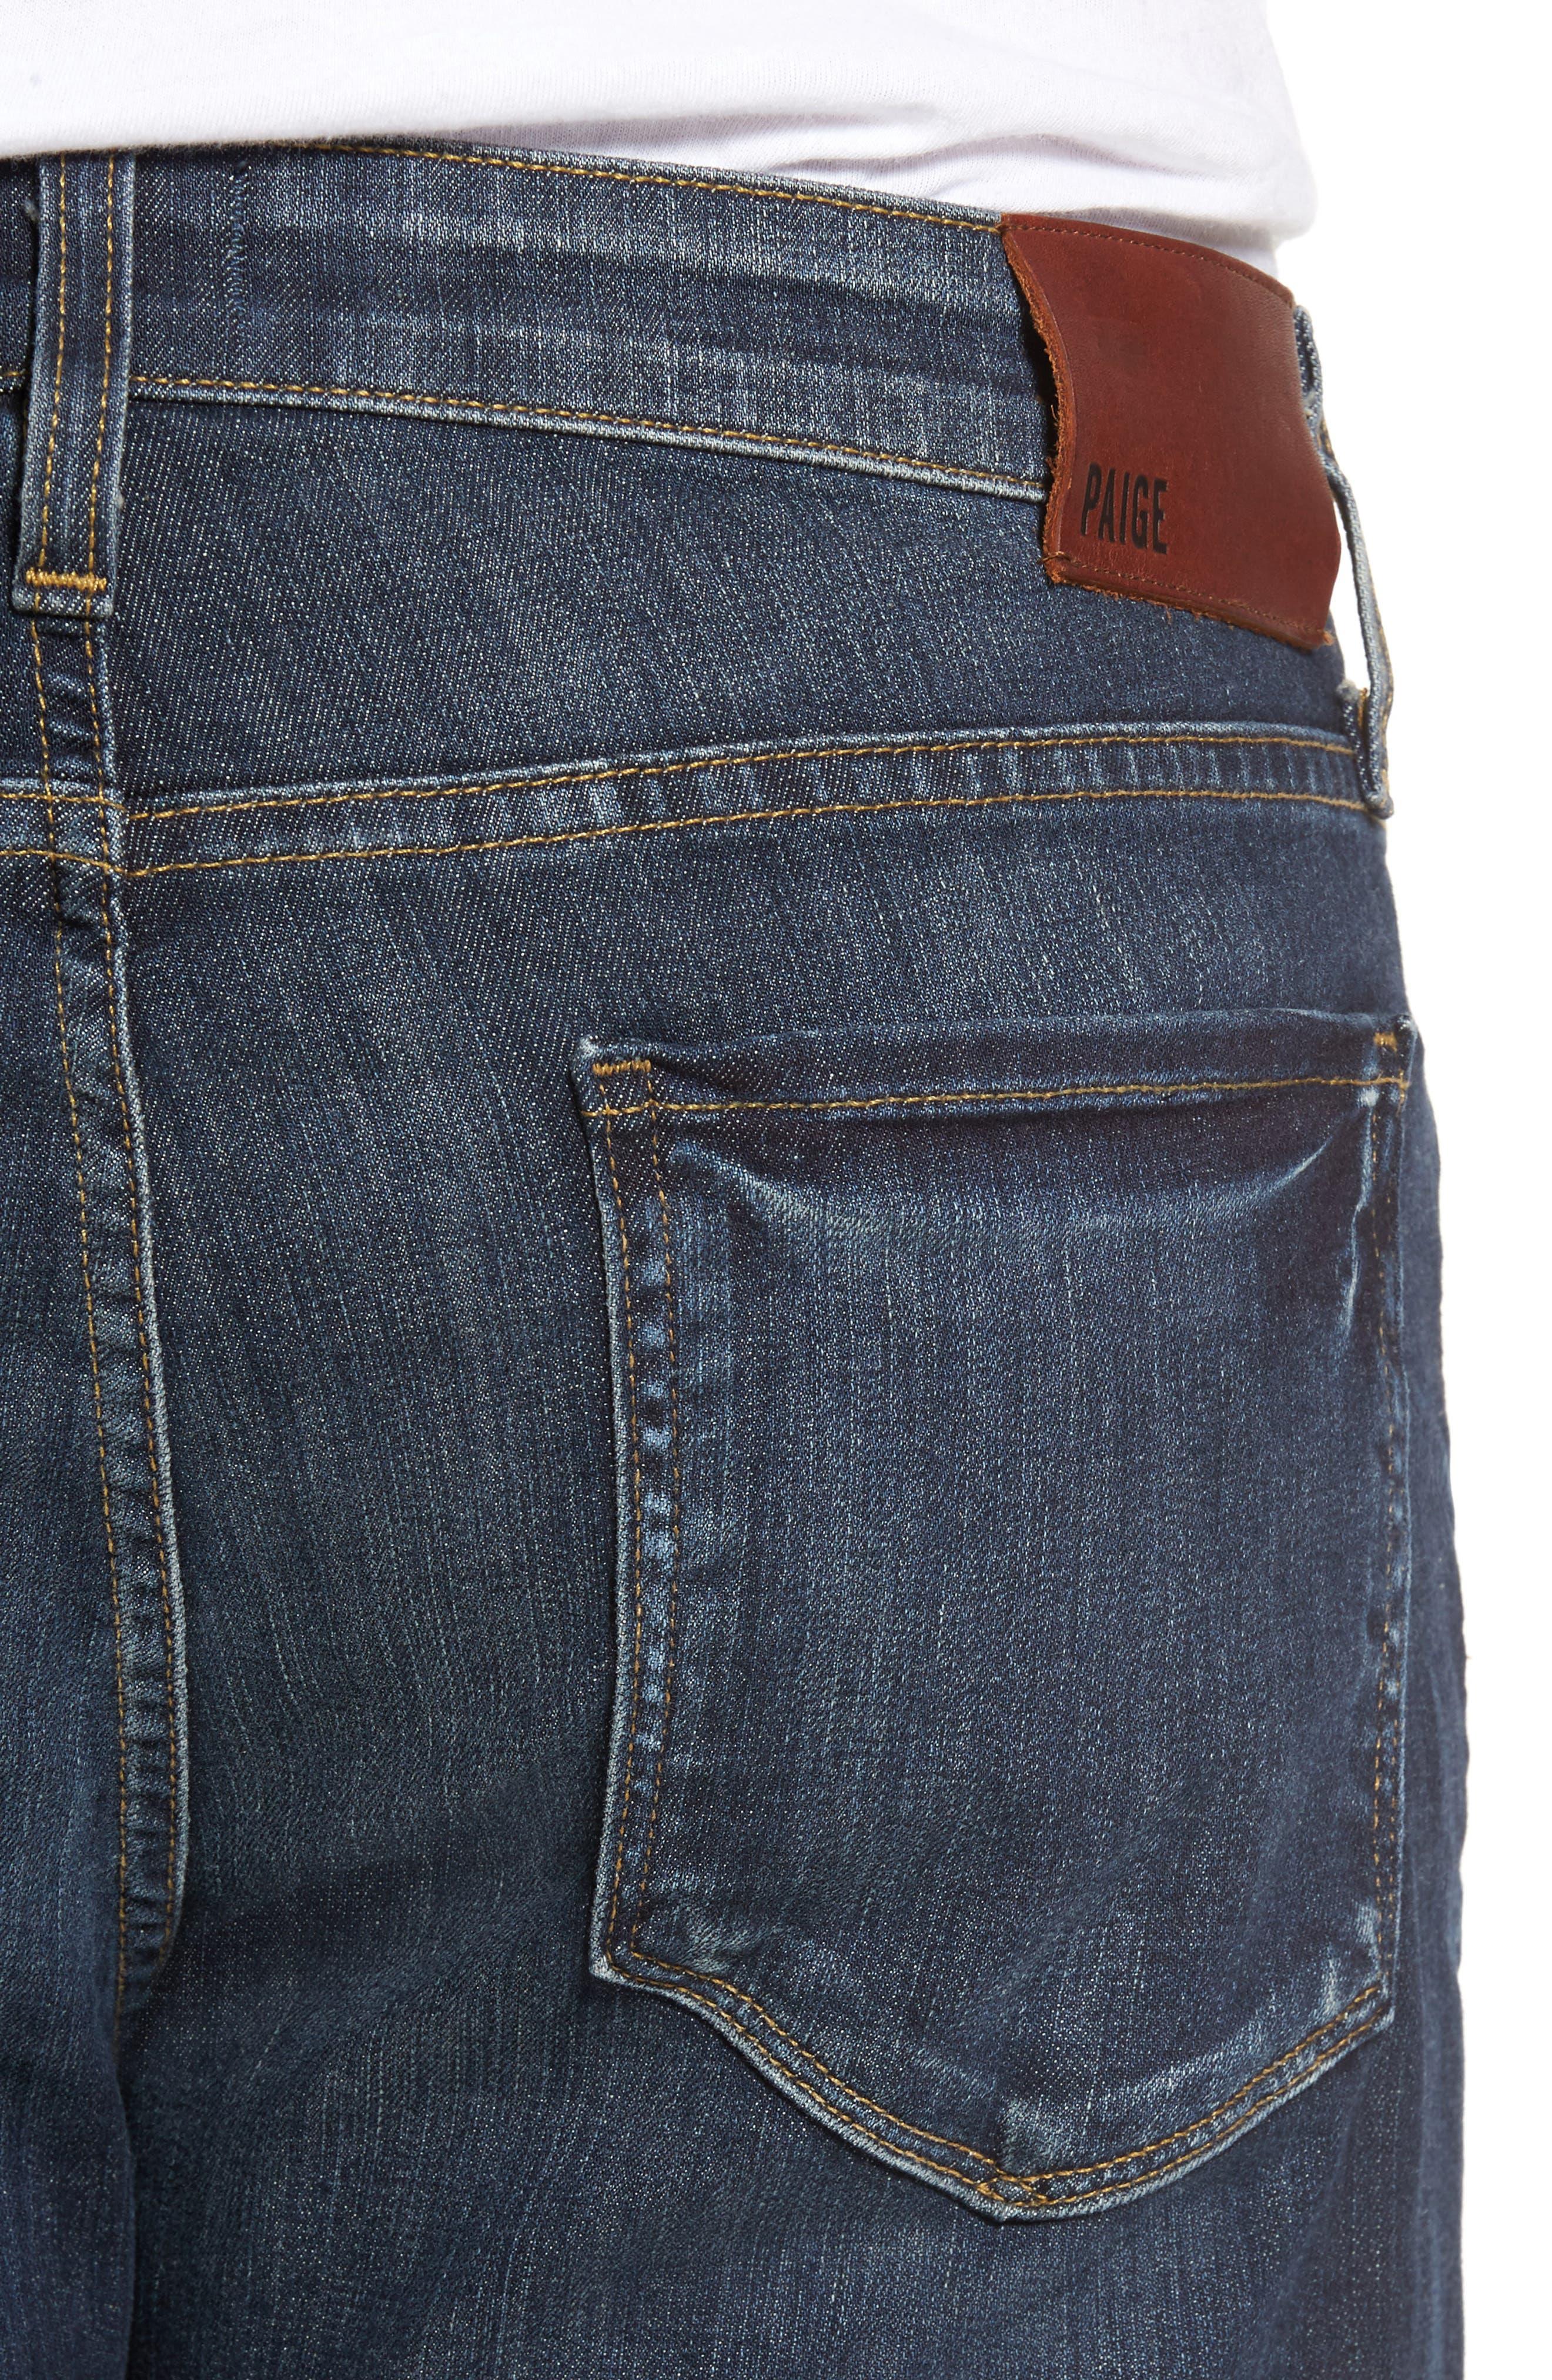 PAIGE,                             Legacy - Federal Slim Straight Leg Jeans,                             Alternate thumbnail 4, color,                             400